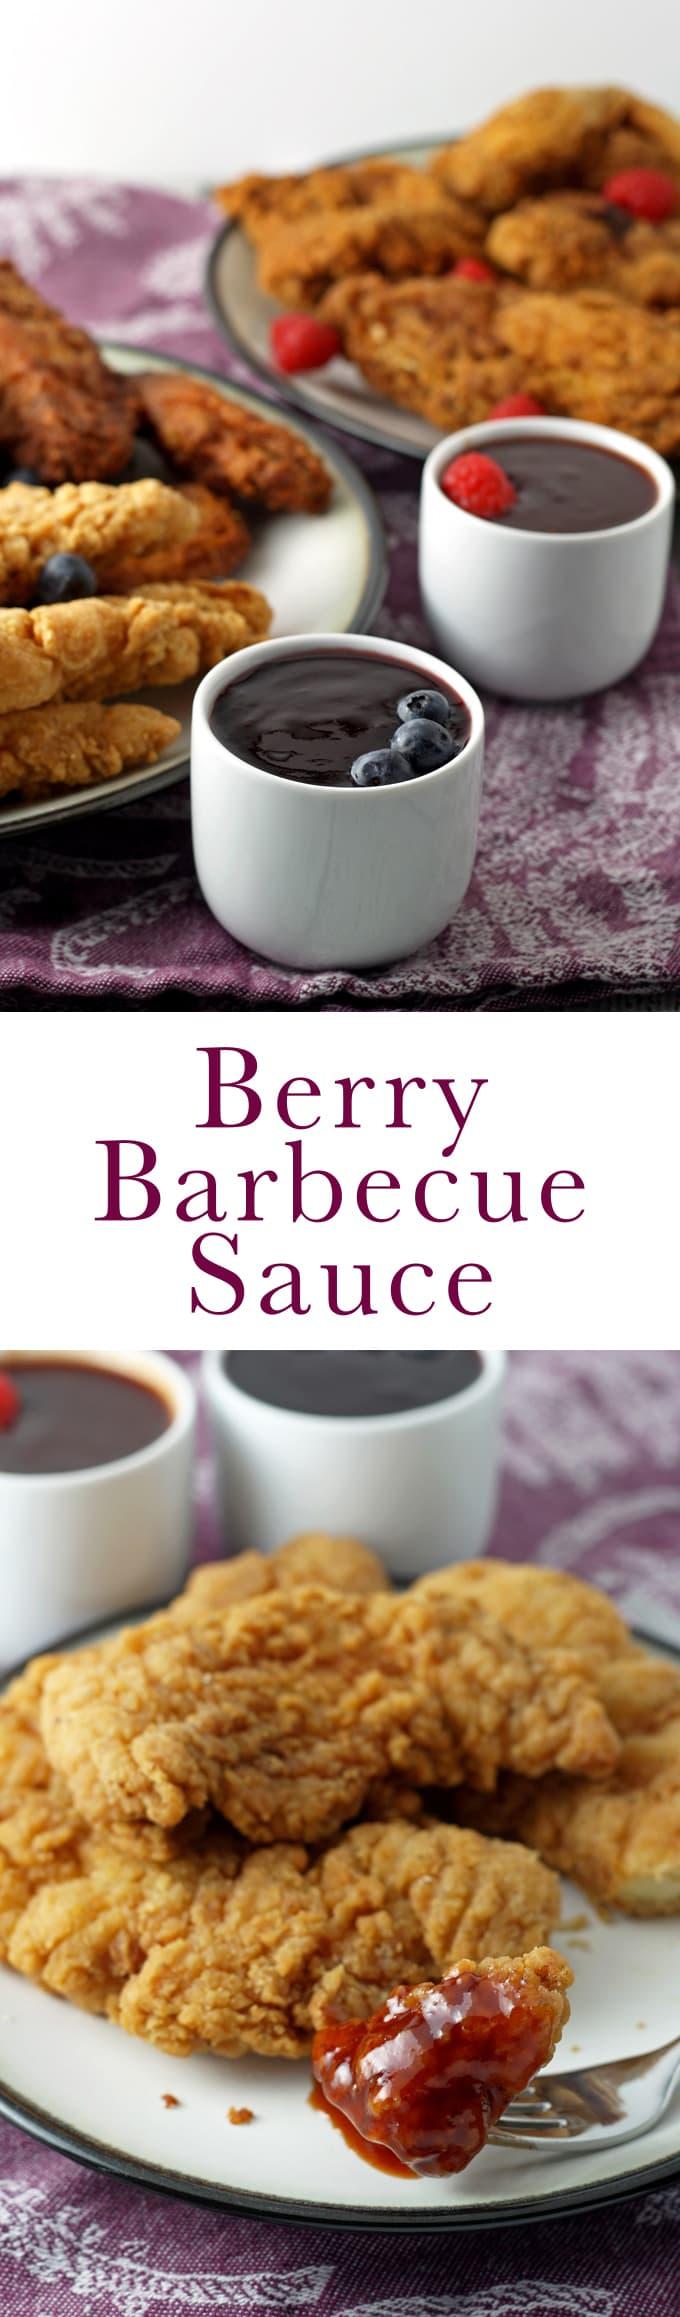 Berry Barbecue Sauce - perfect for dipping chicken! | honeyandbirch.com